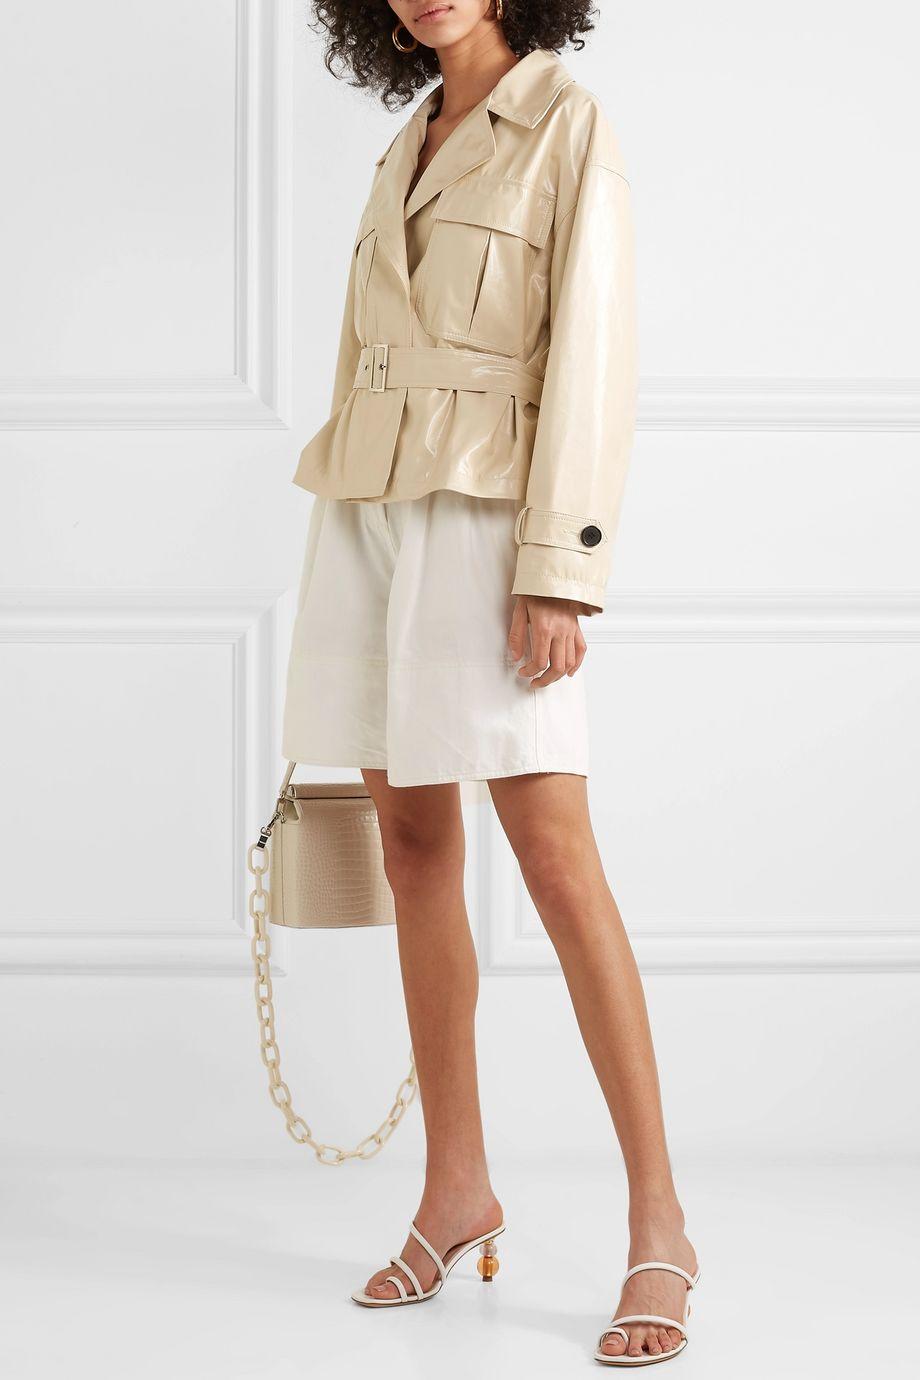 Frankie Shop PVC jacket